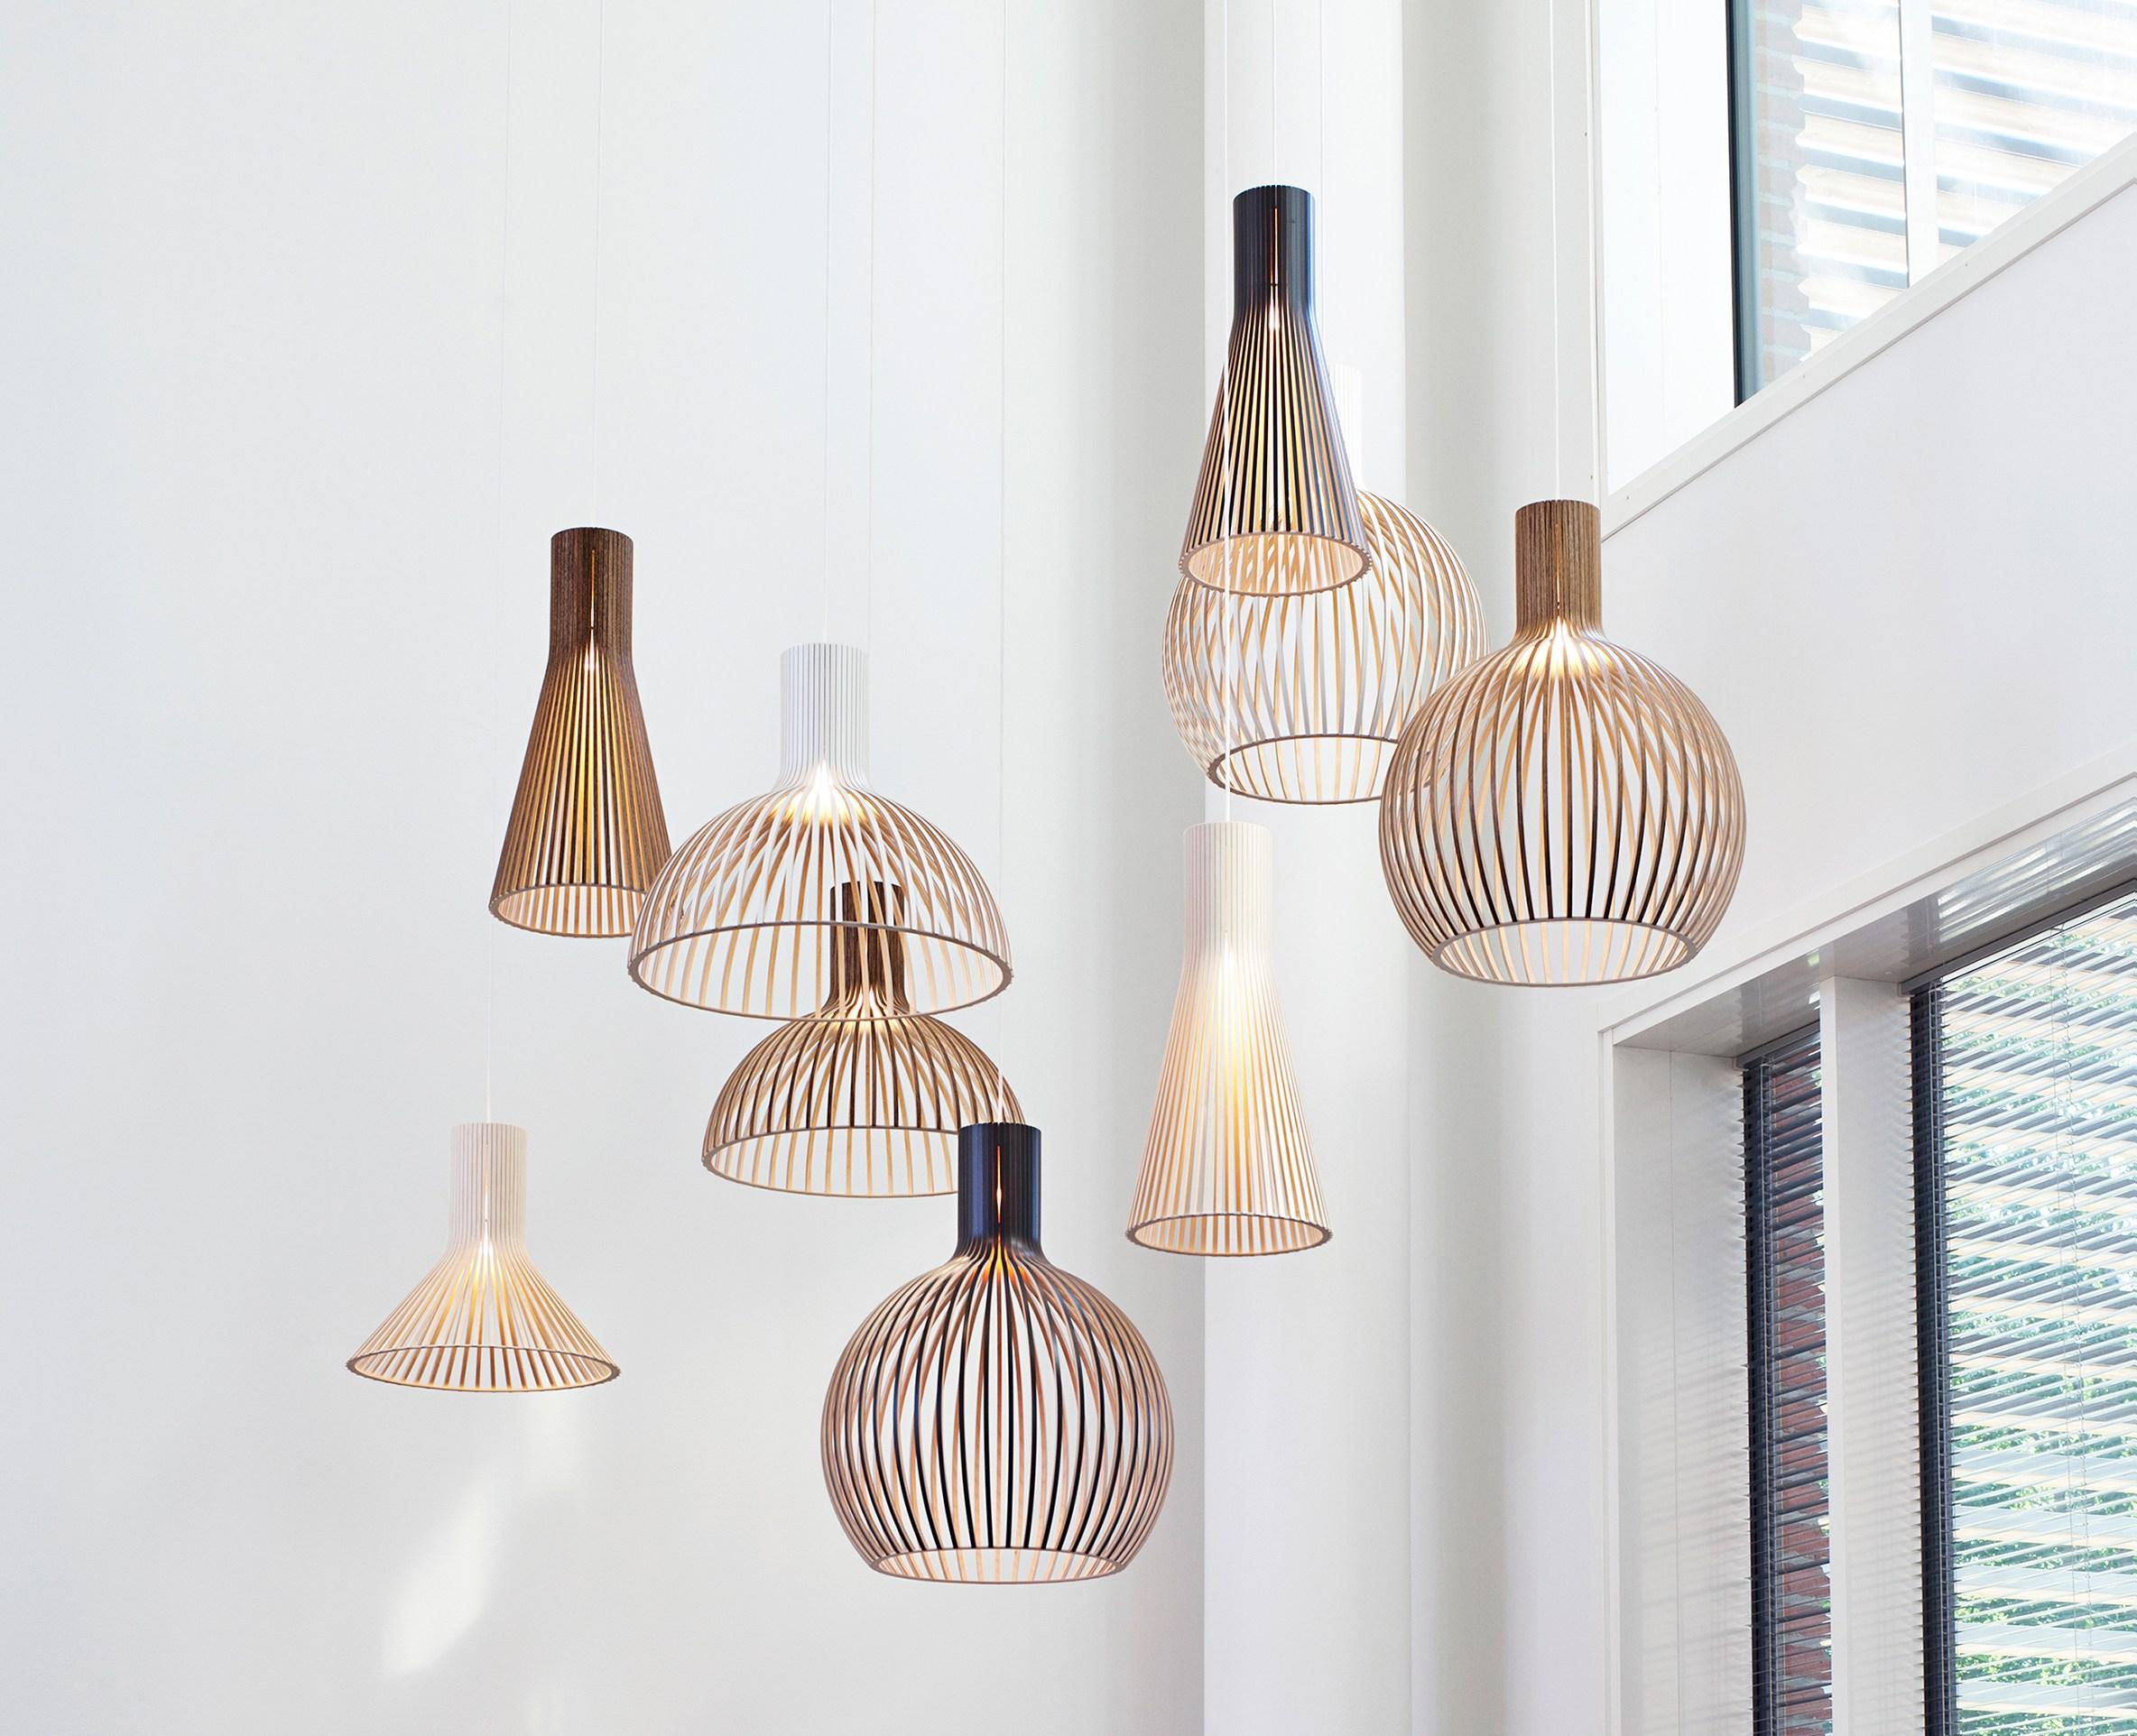 secto design eine leuchten premiere in holz designblog. Black Bedroom Furniture Sets. Home Design Ideas